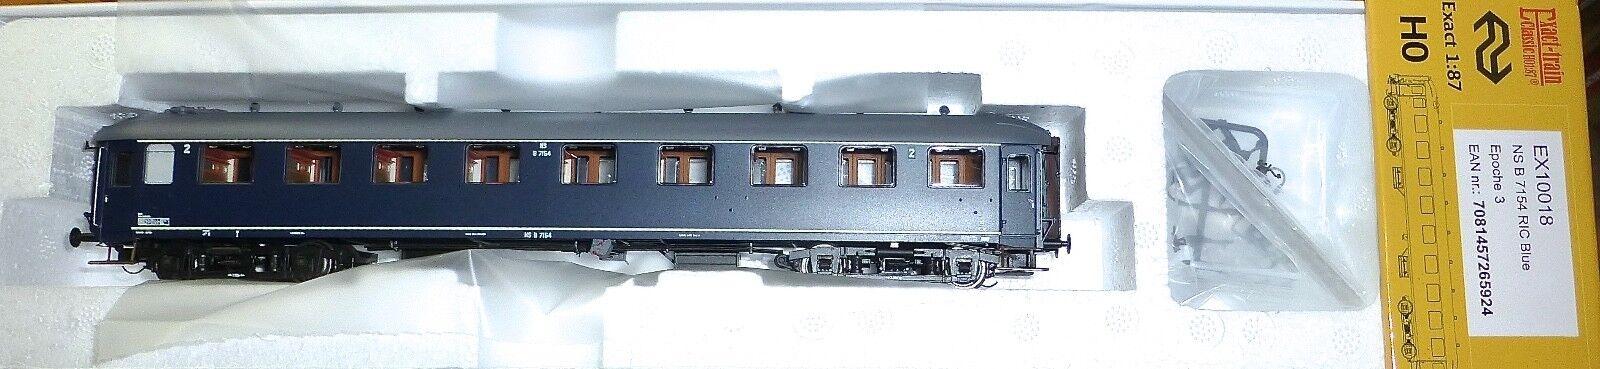 Exact-Train ex10018 ns a 7154 Ric blu epiii h0 1 87 OVP hv3 µg